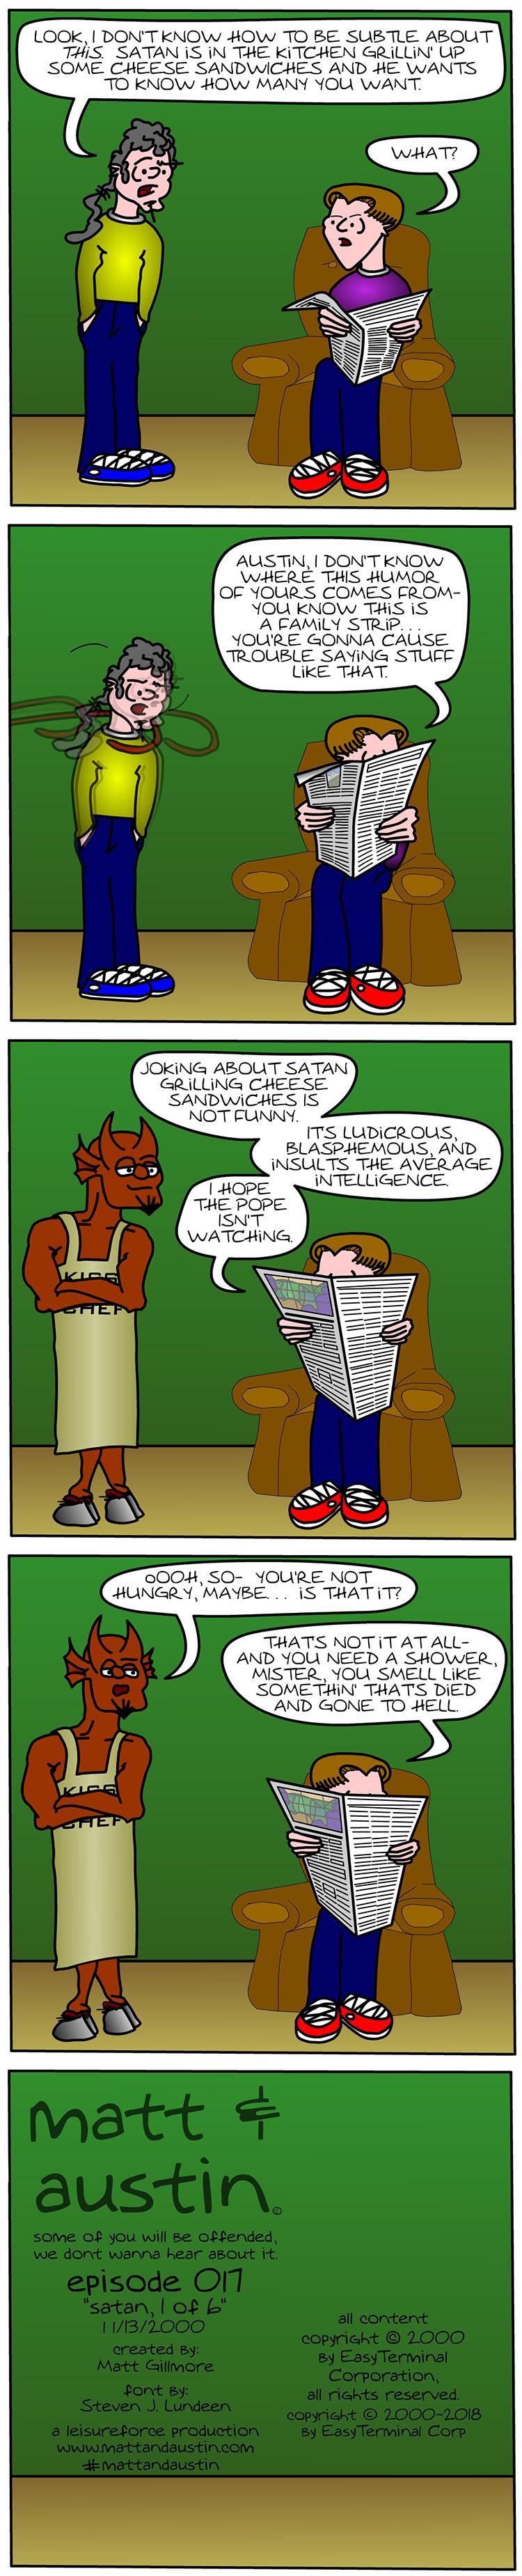 Webcomic The Matt And Austin Comic Strip #017 Satan, 1 of 6